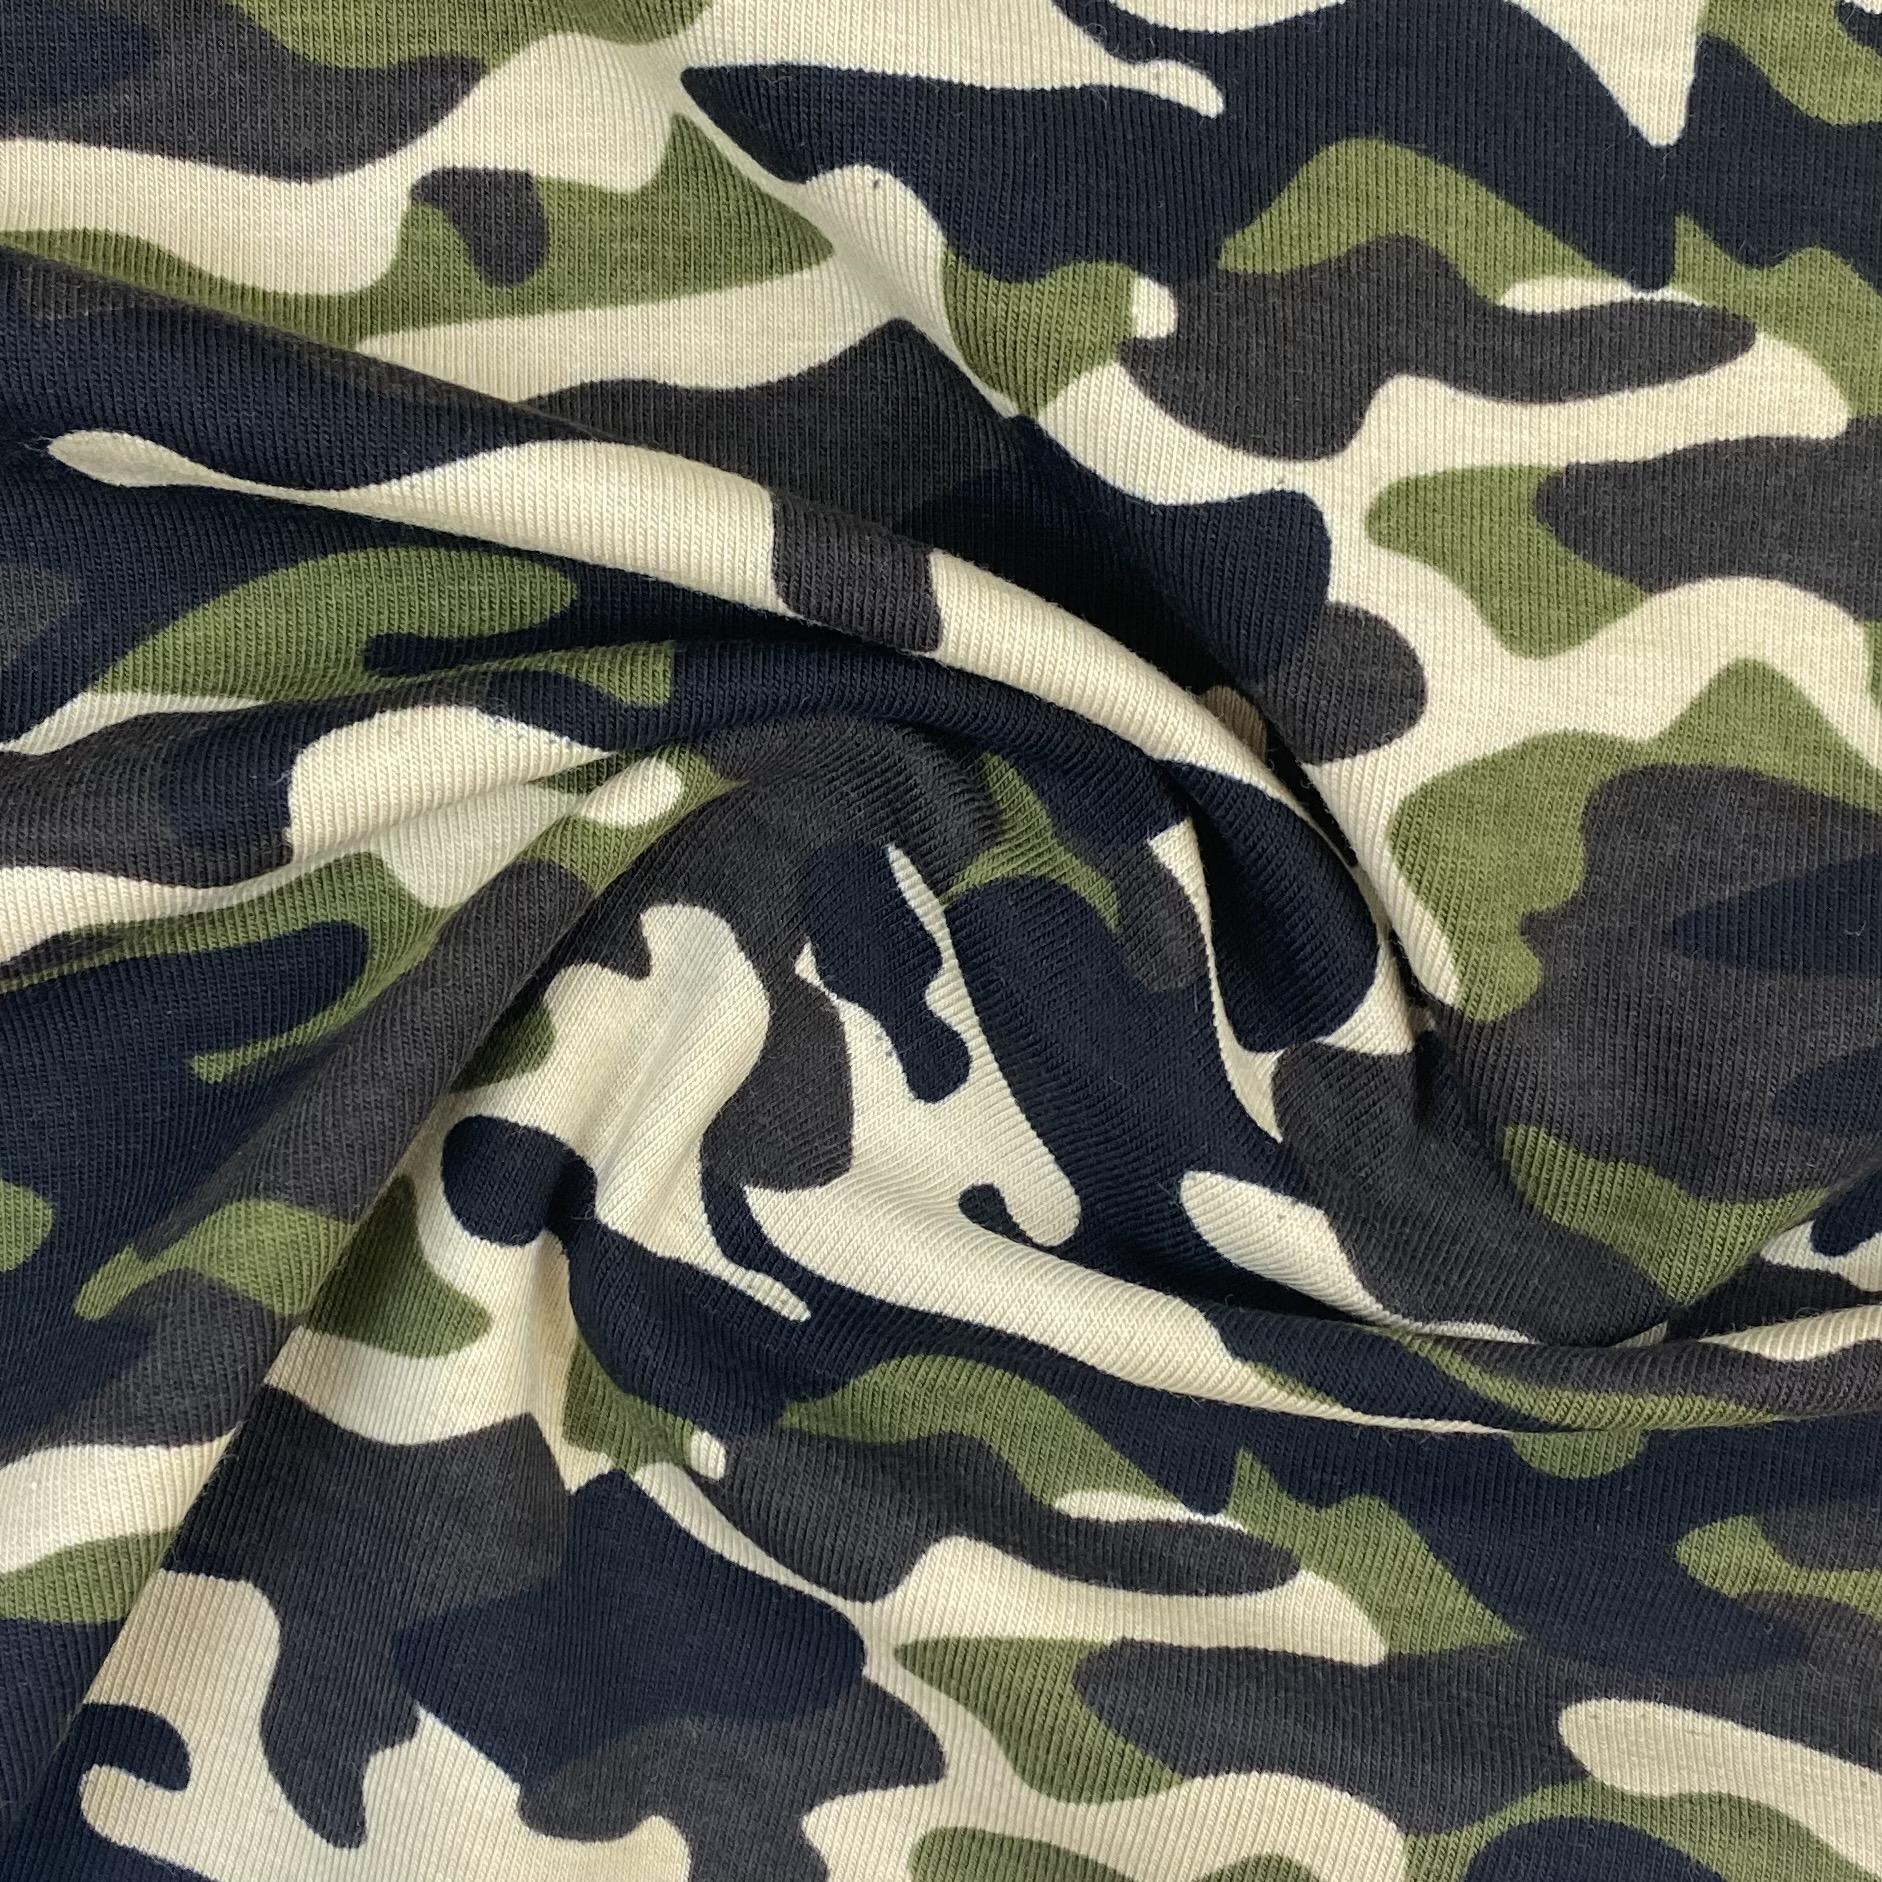 Baumwolljersey, Camouflage grün, Art. 340084.001